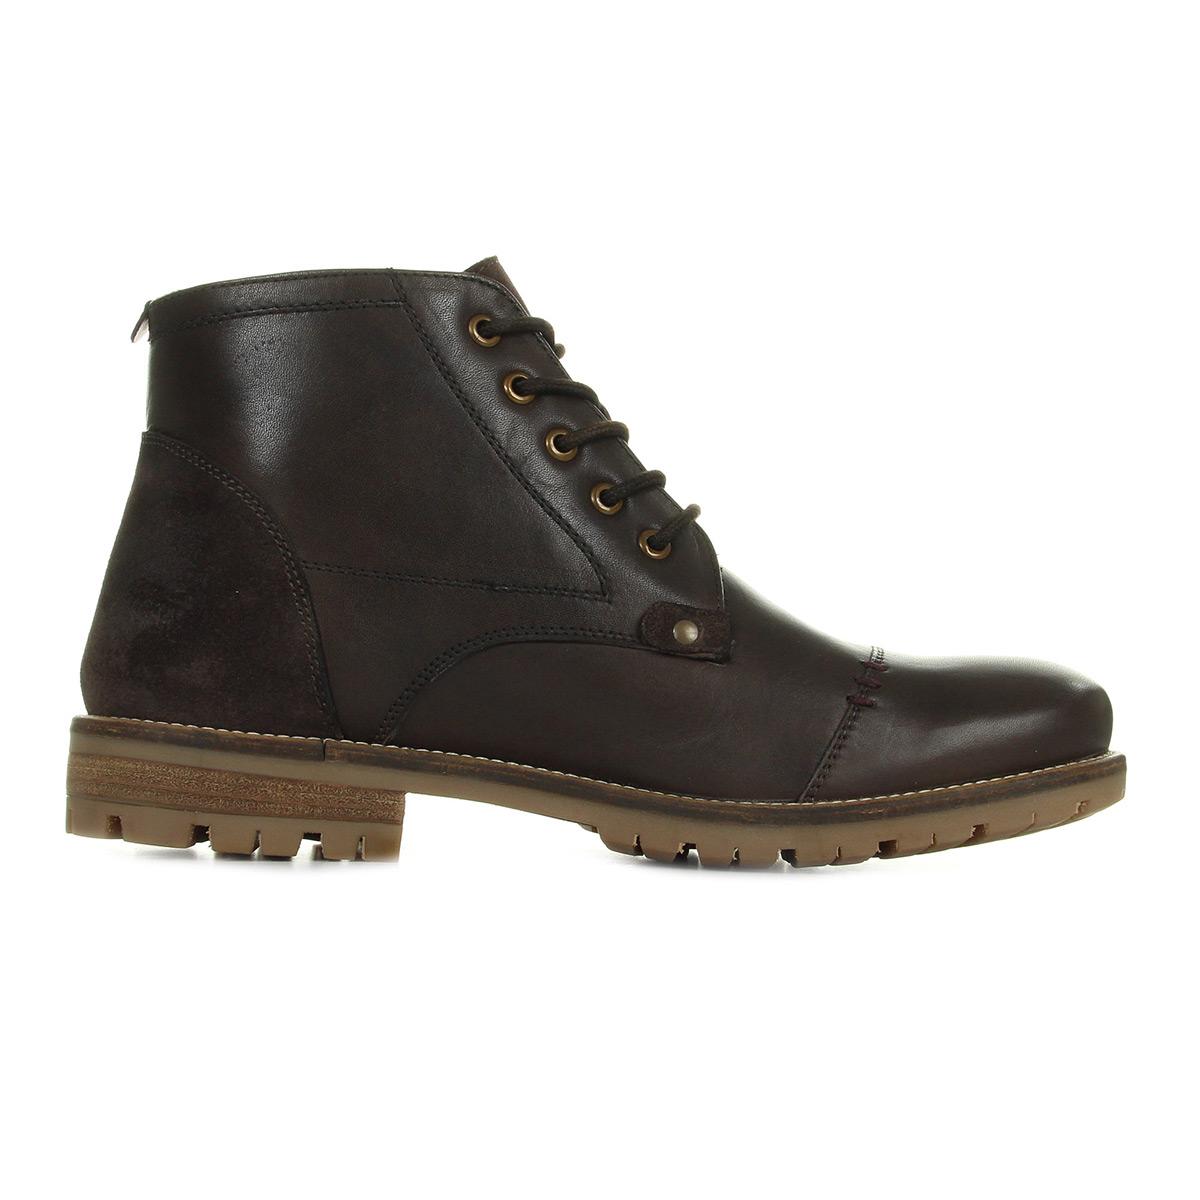 Kickers Fanfarno Cuir Marron 589880609, Boots homme